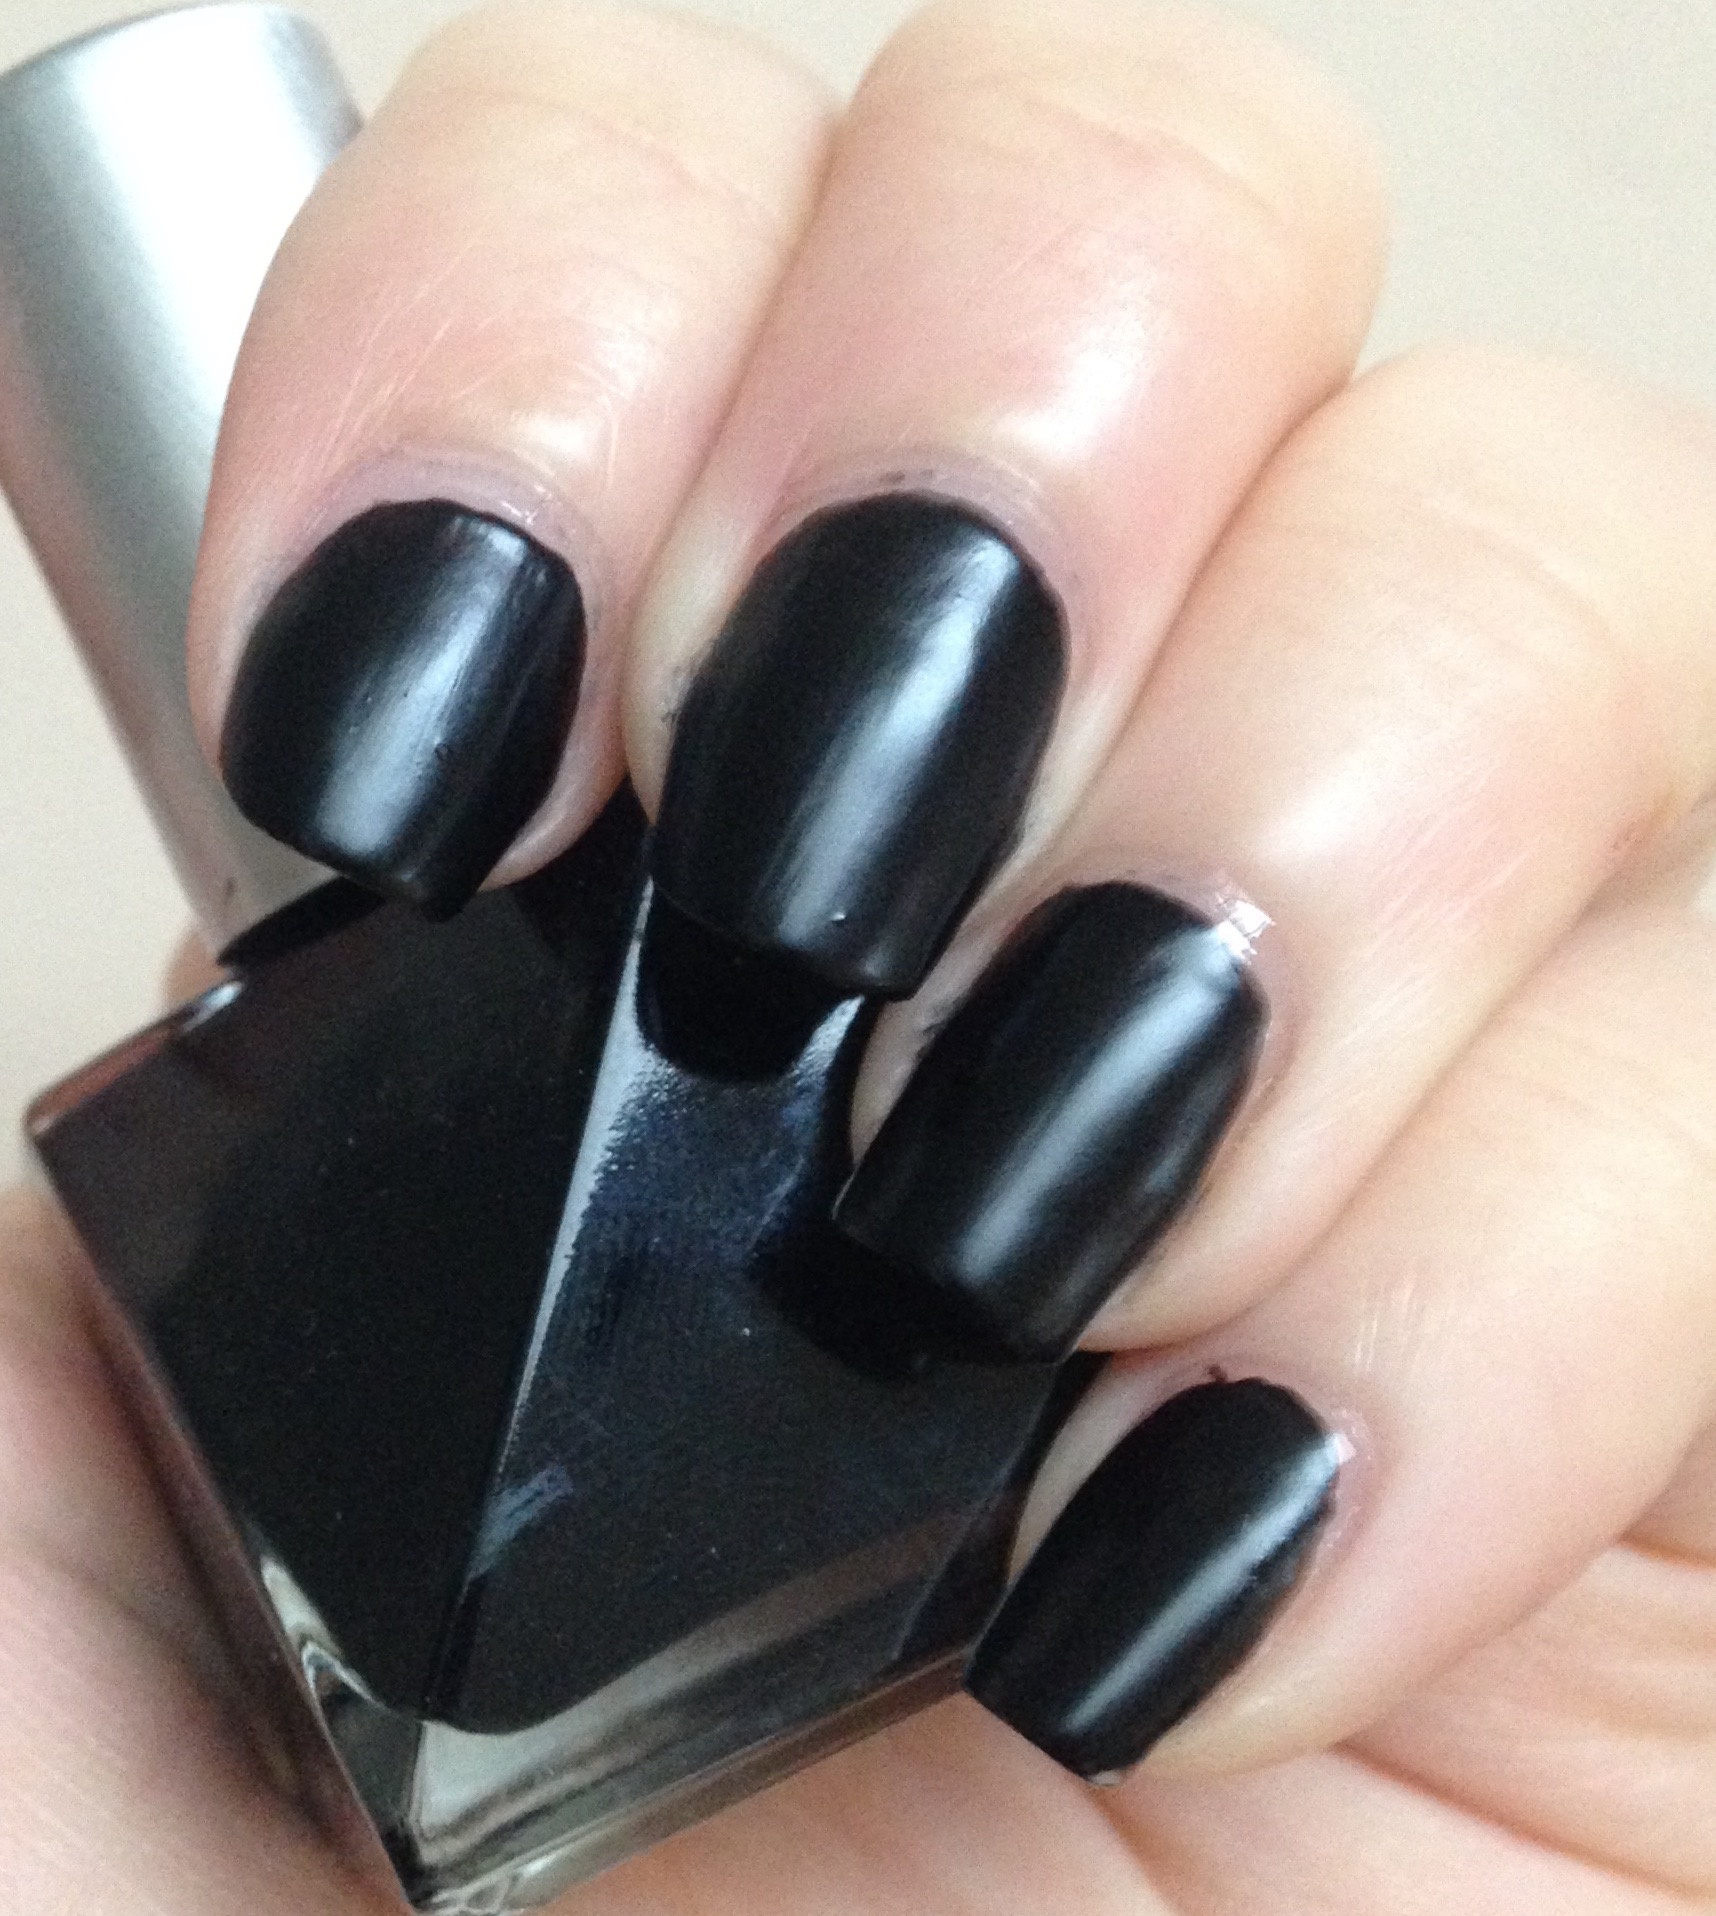 My Top 5 Dark Nail Polishes for Fall | #FallintoPolishland ...